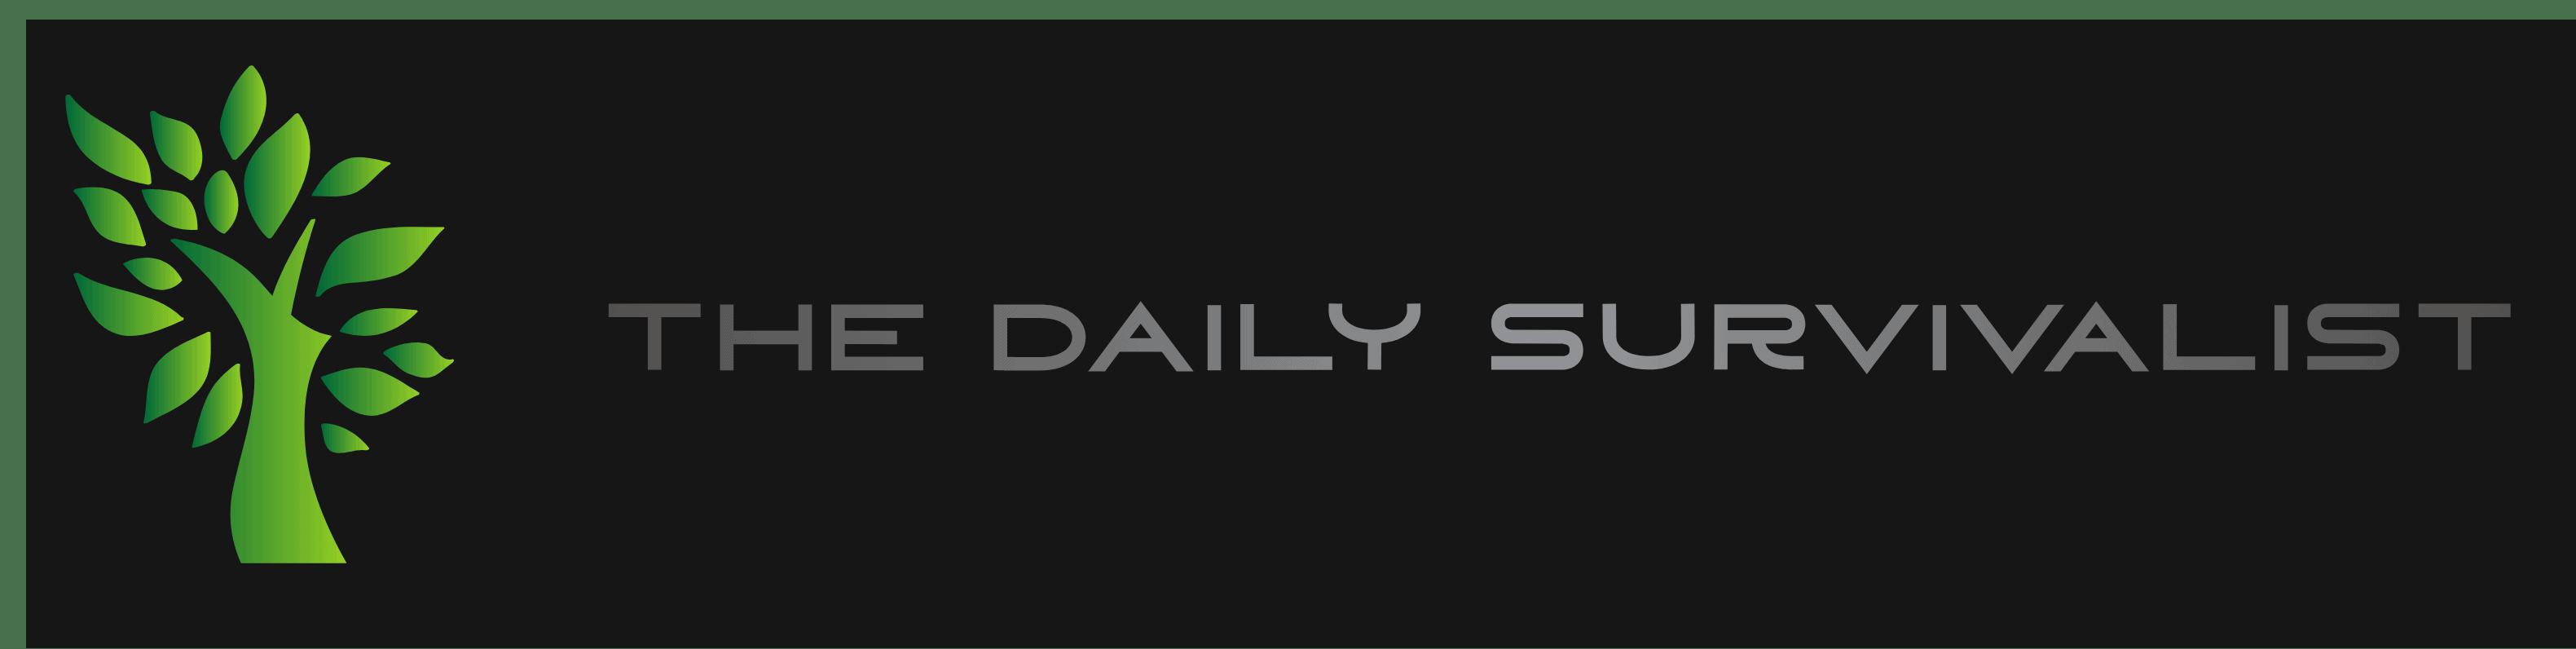 the daily survivalist logo